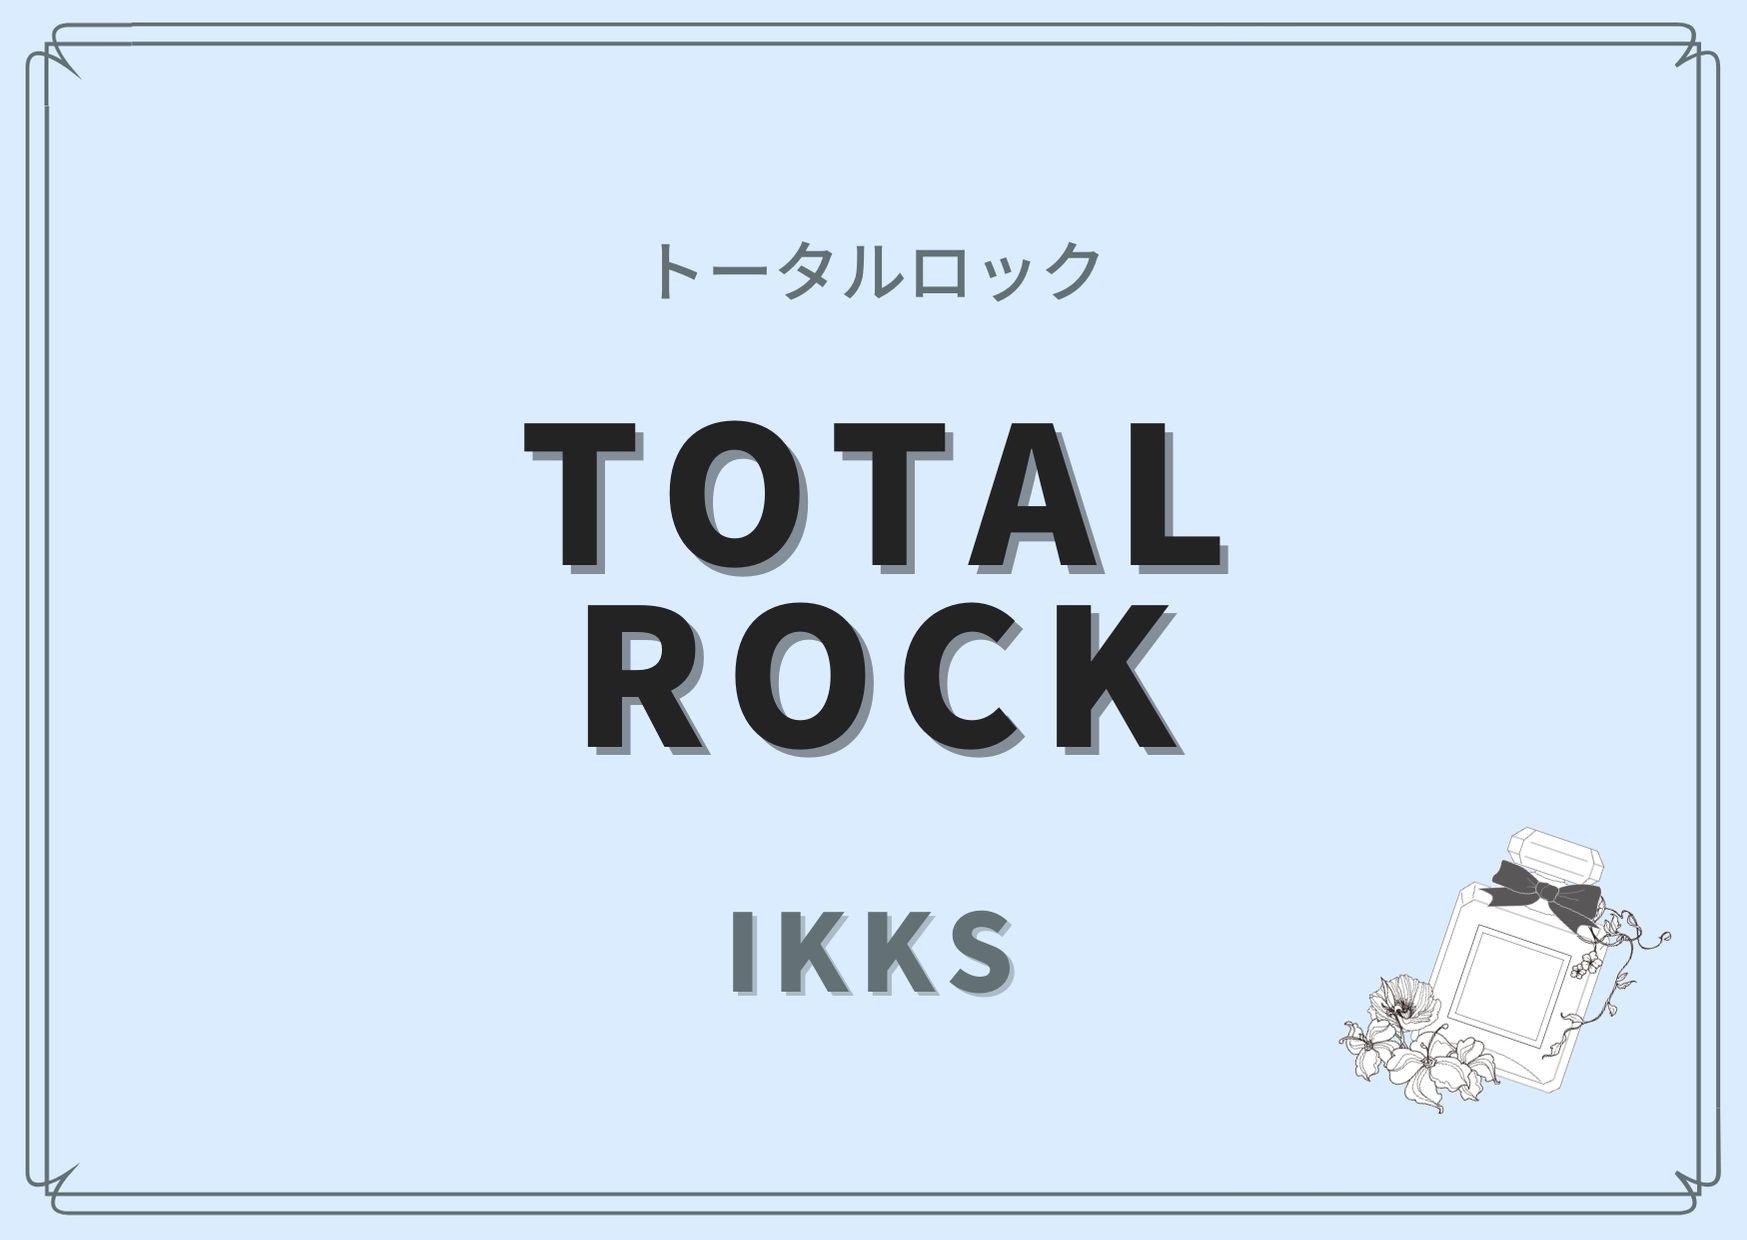 TOTAL ROCK(トータルロック)/IKKS(イックス)